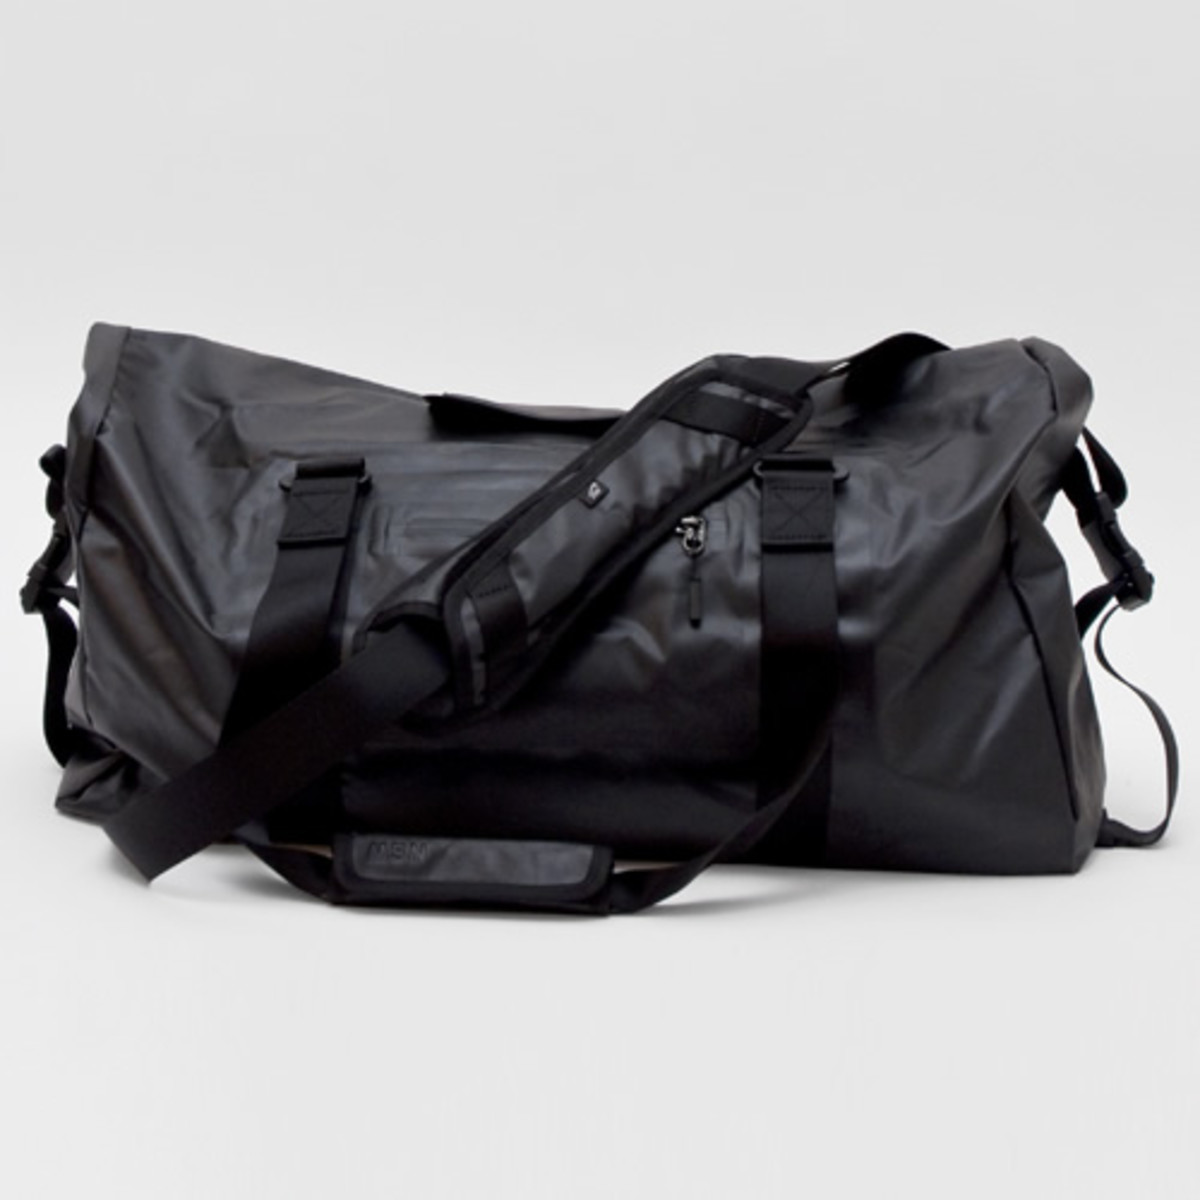 https   www.acquiremag.com style nike-sportswear-duffle 2014-11 ... 3e0d19809b899